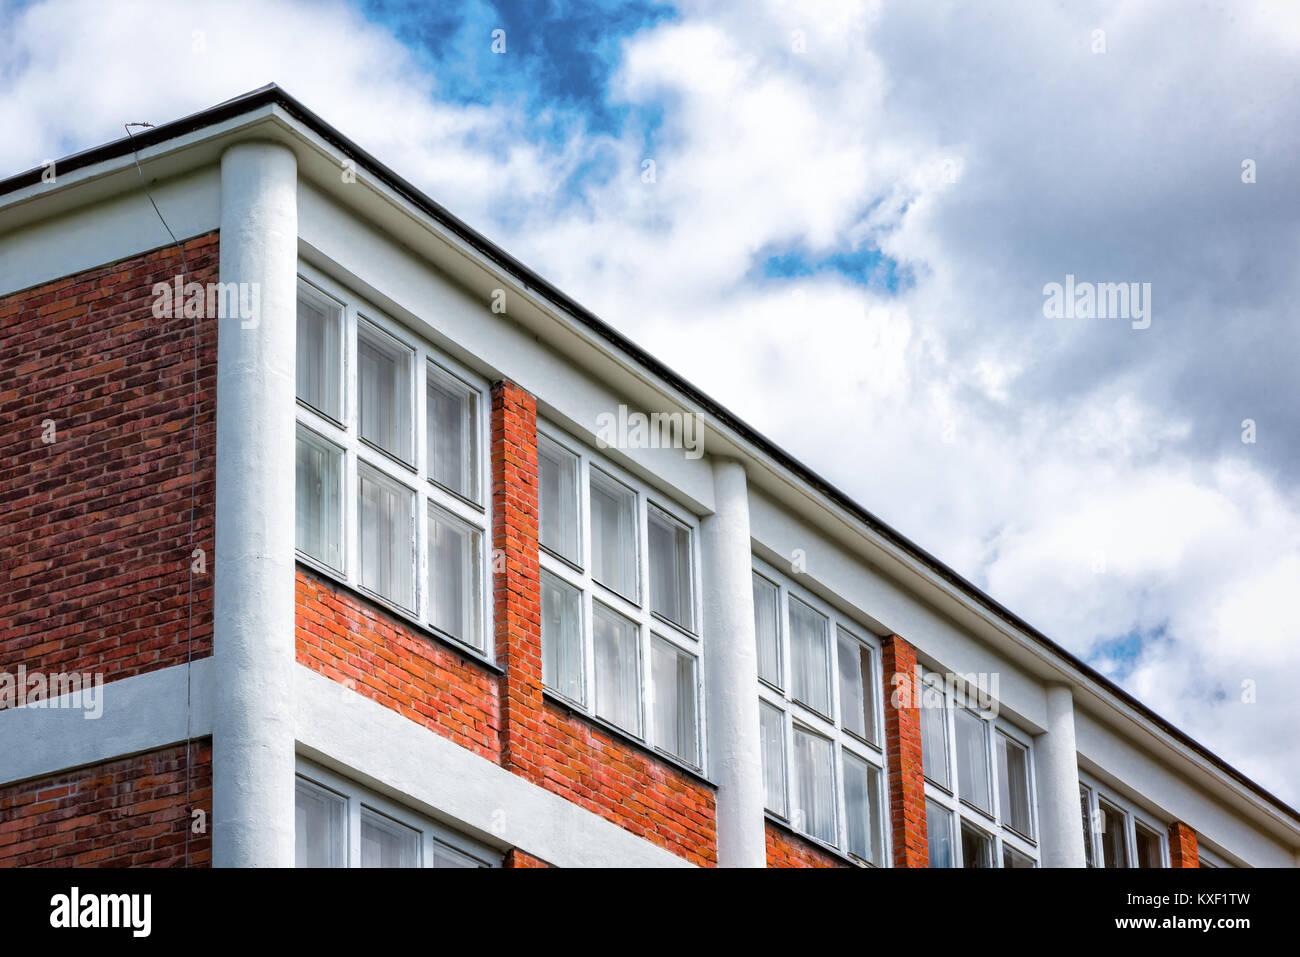 Architectural Design of Administrative Buildings in Zlin, Czech Republic - Stock Image